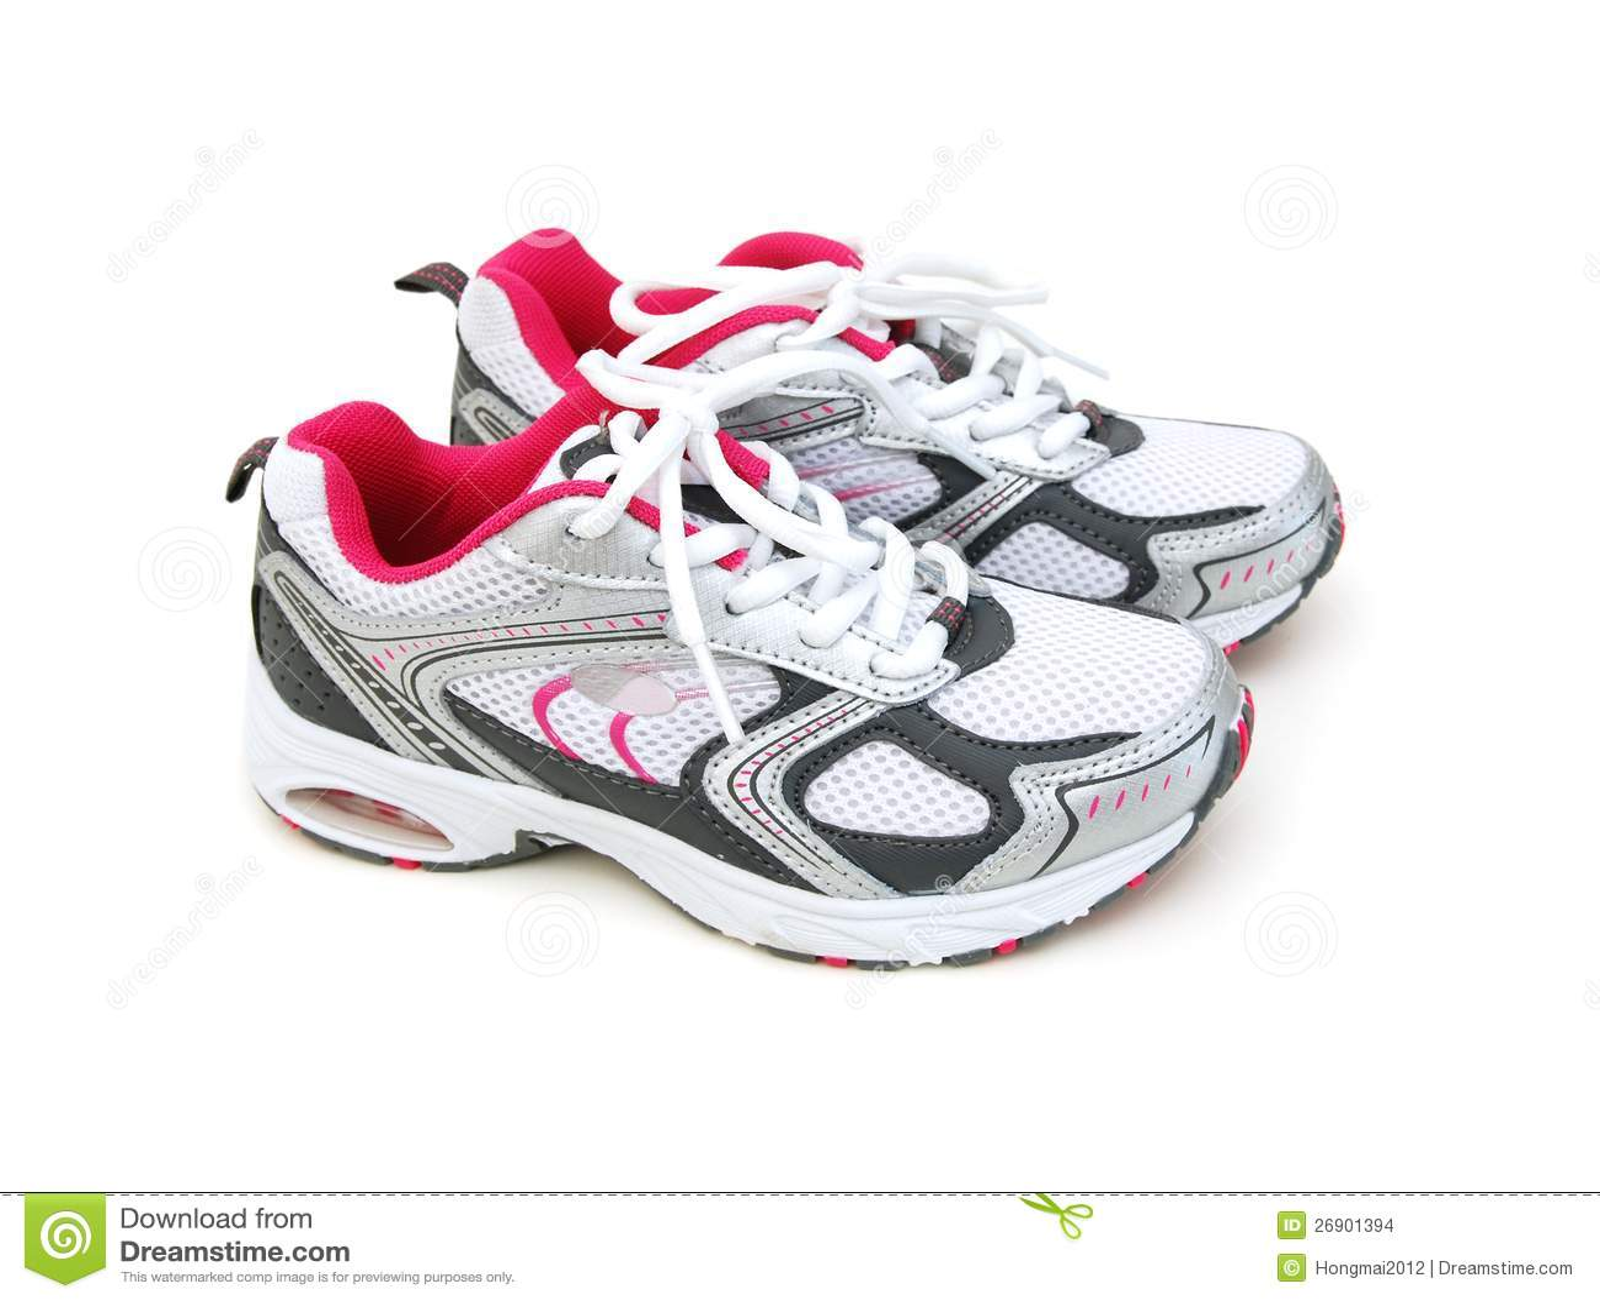 f8d459e2b85 Παπούτσια που απομονώνονται αθλητικά Στοκ Εικόνες - εικόνα από ...